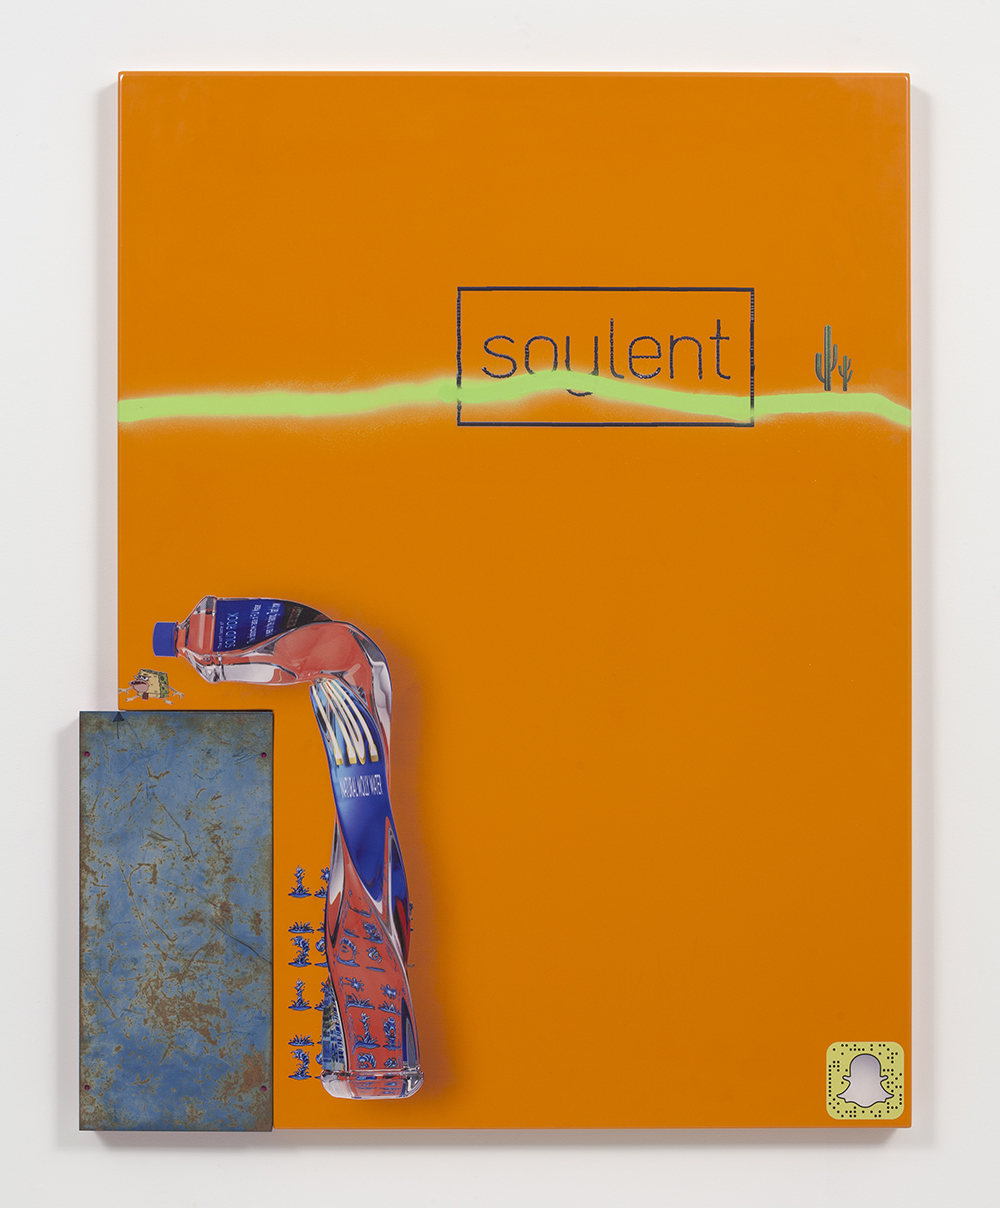 Yung Jake, soylent, Steve Turner, Los Angeles, Untitled art fair, Untitled Miami Beach, Net art, post-internet art, Internet art, emoji art, snapchat